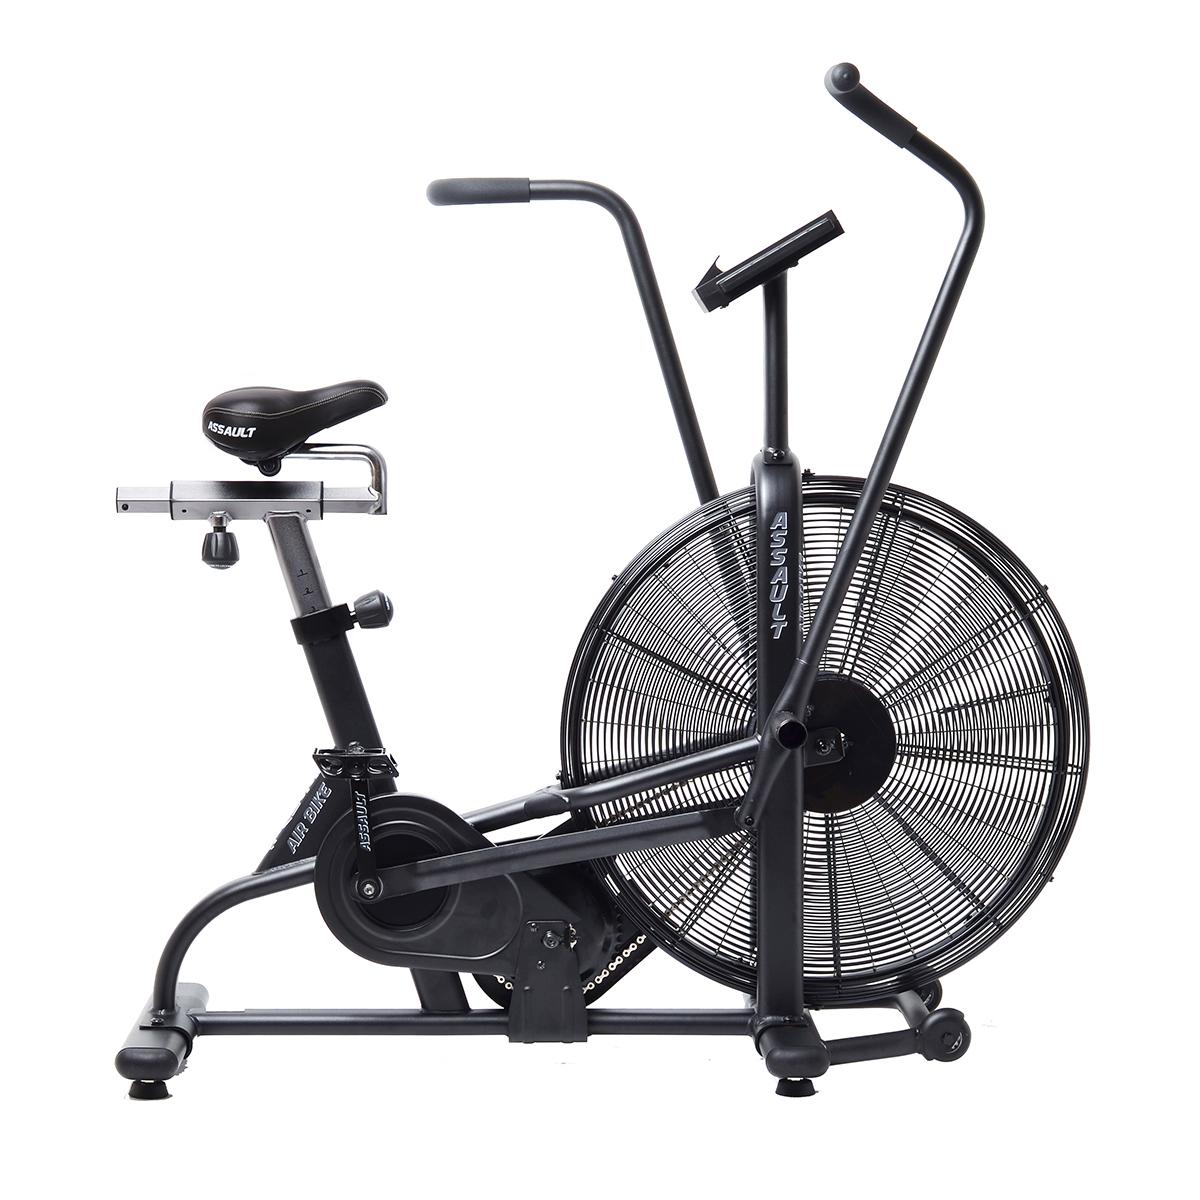 assault air bike see it cheaper and we\u0027ll price match! d8 fitnessassault air bike